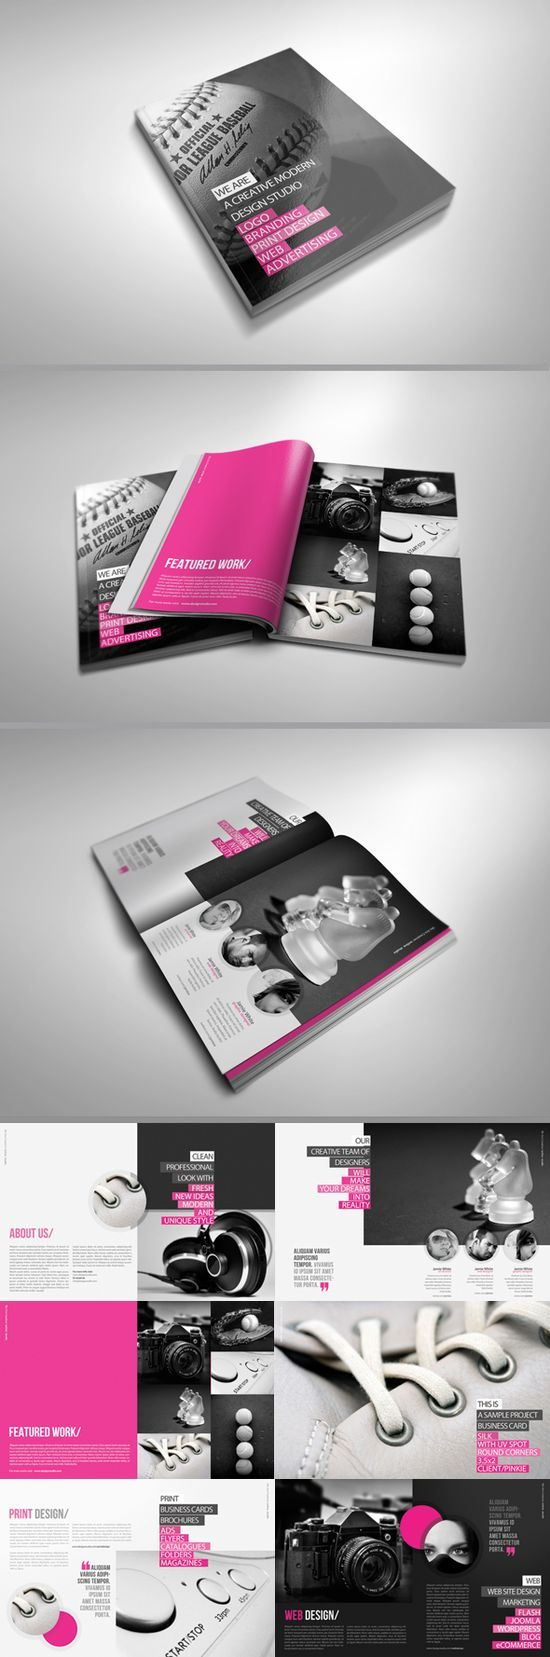 Style Inspiration Internship Report